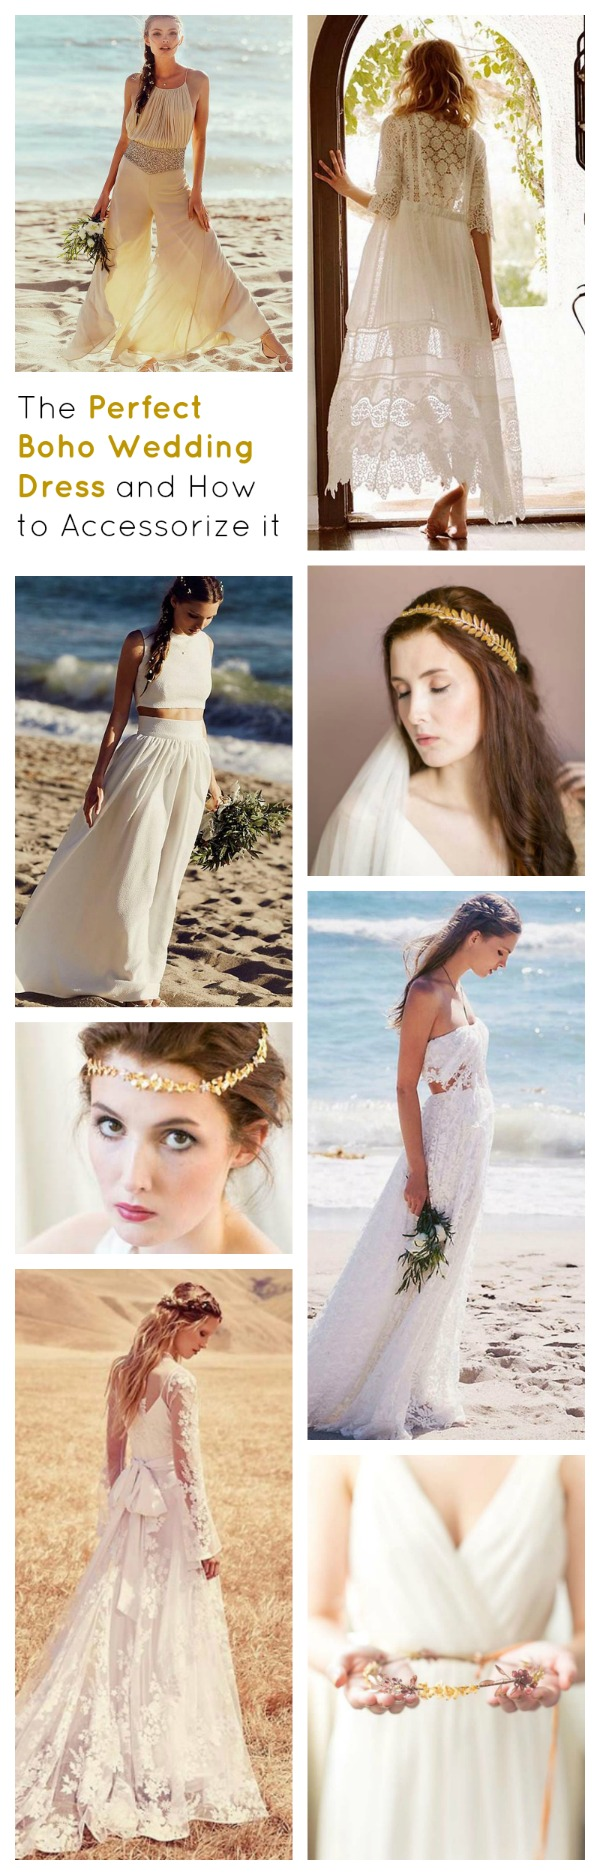 boho wedding dress accessories